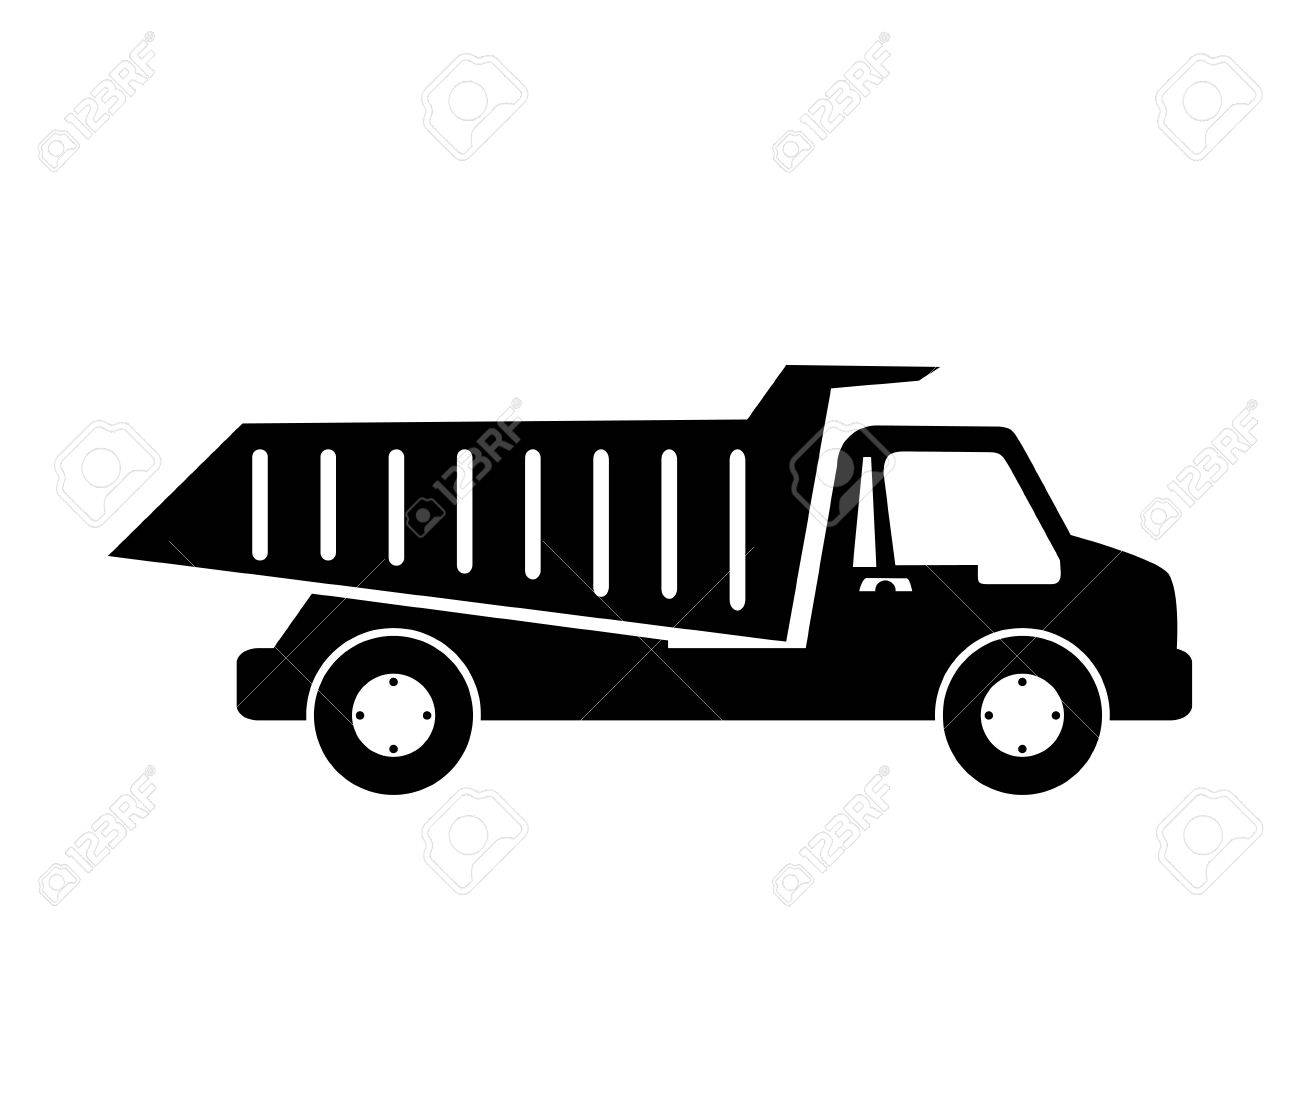 Truck Dumping Dump Construction Isolated Vector Illustration Eps 10 Stock